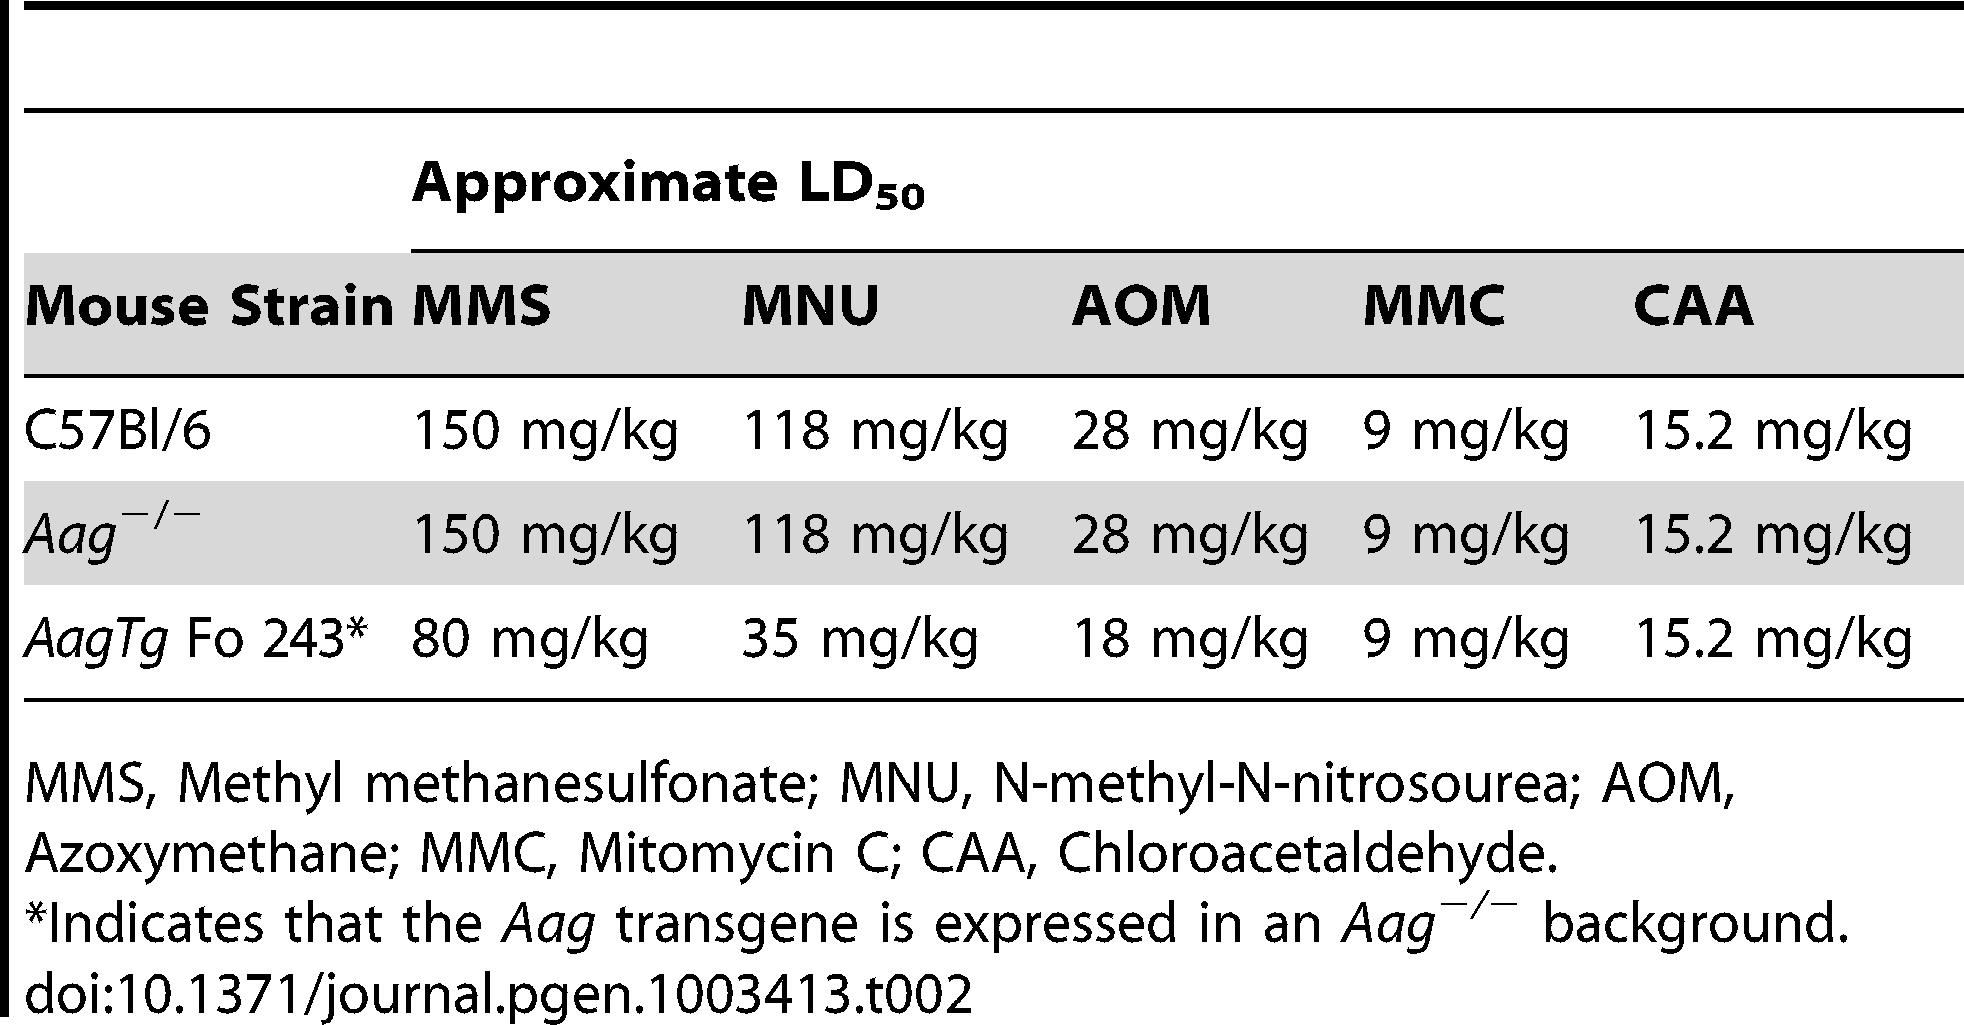 Approximate LD<sub>50</sub> of <i>Aag</i><sup>−/−</sup> and <i>Aag</i> transgenic mice to various genotoxic agents.